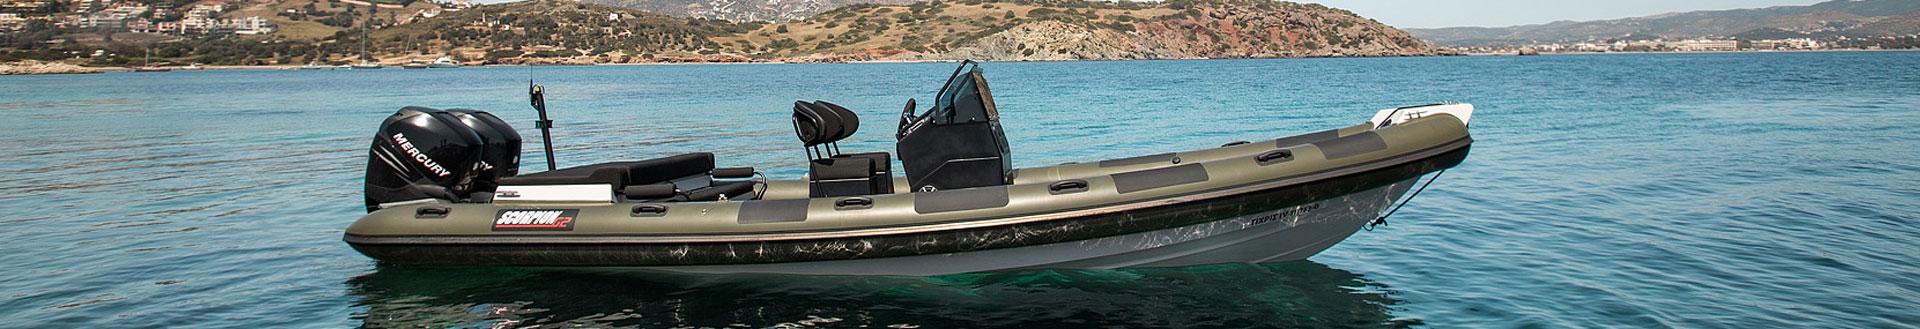 mykonos ribs speed boat rentals